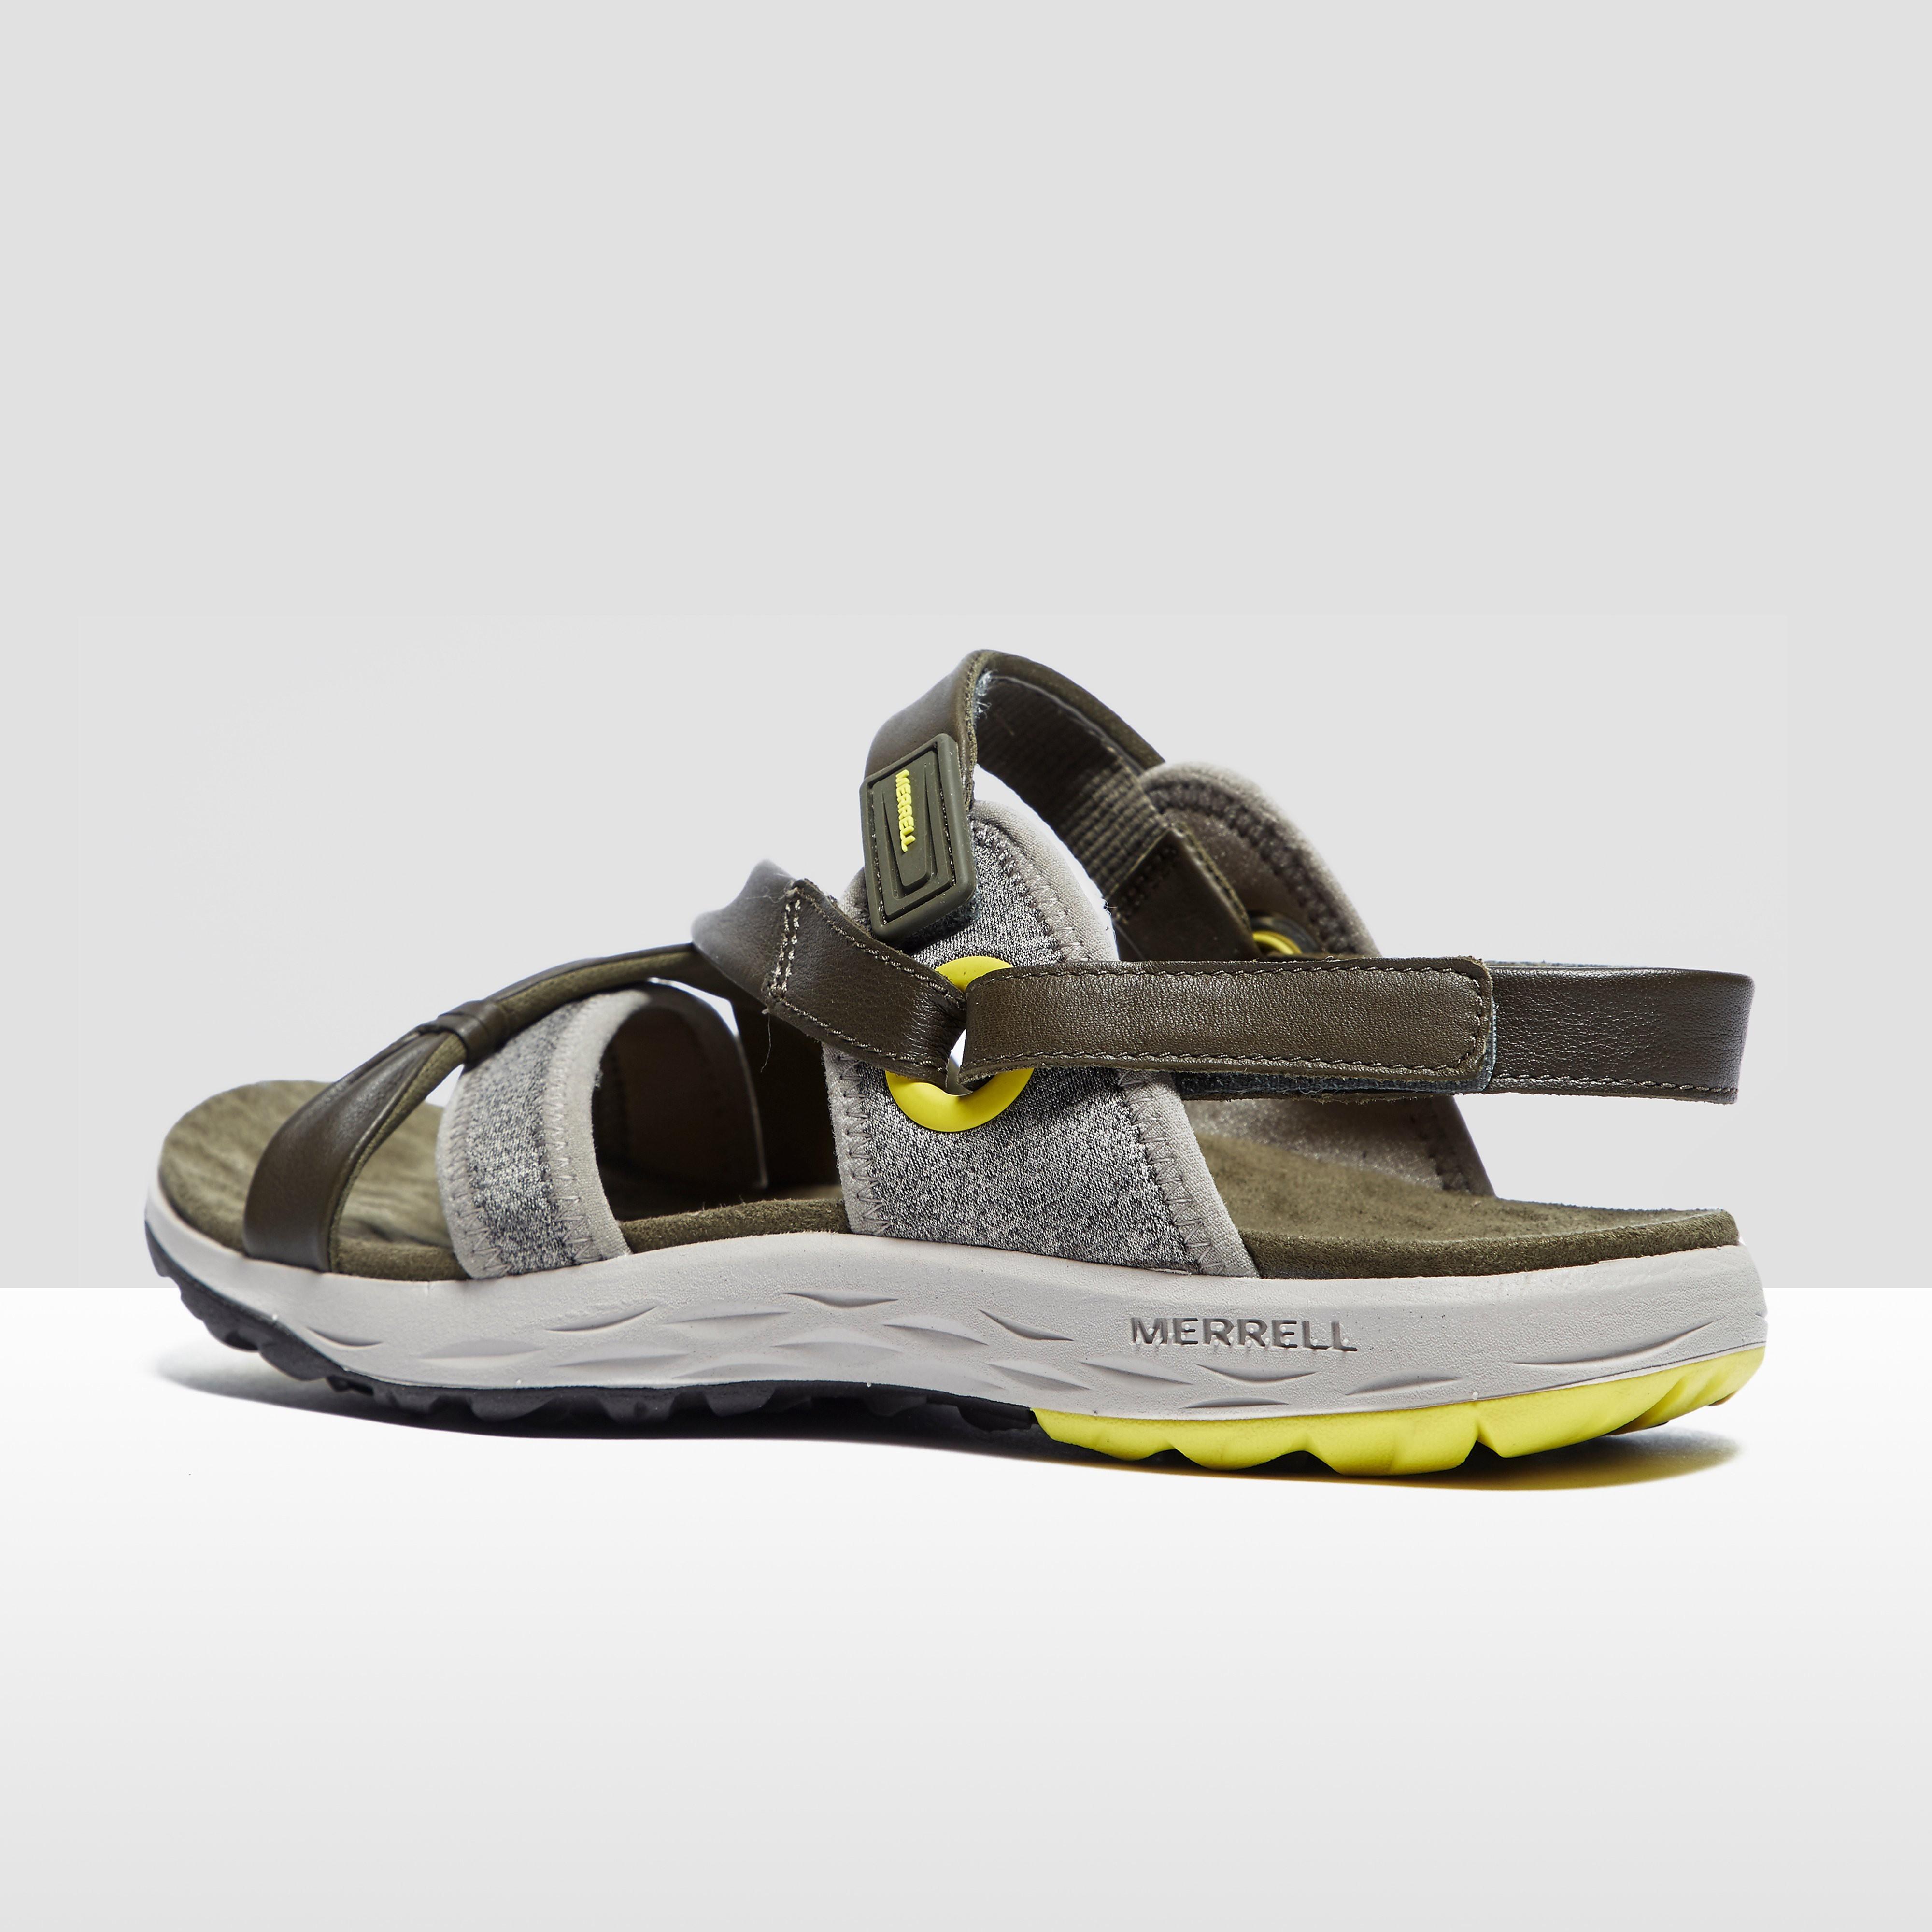 Merrell Vesper Lattice Women's Walking Sandals